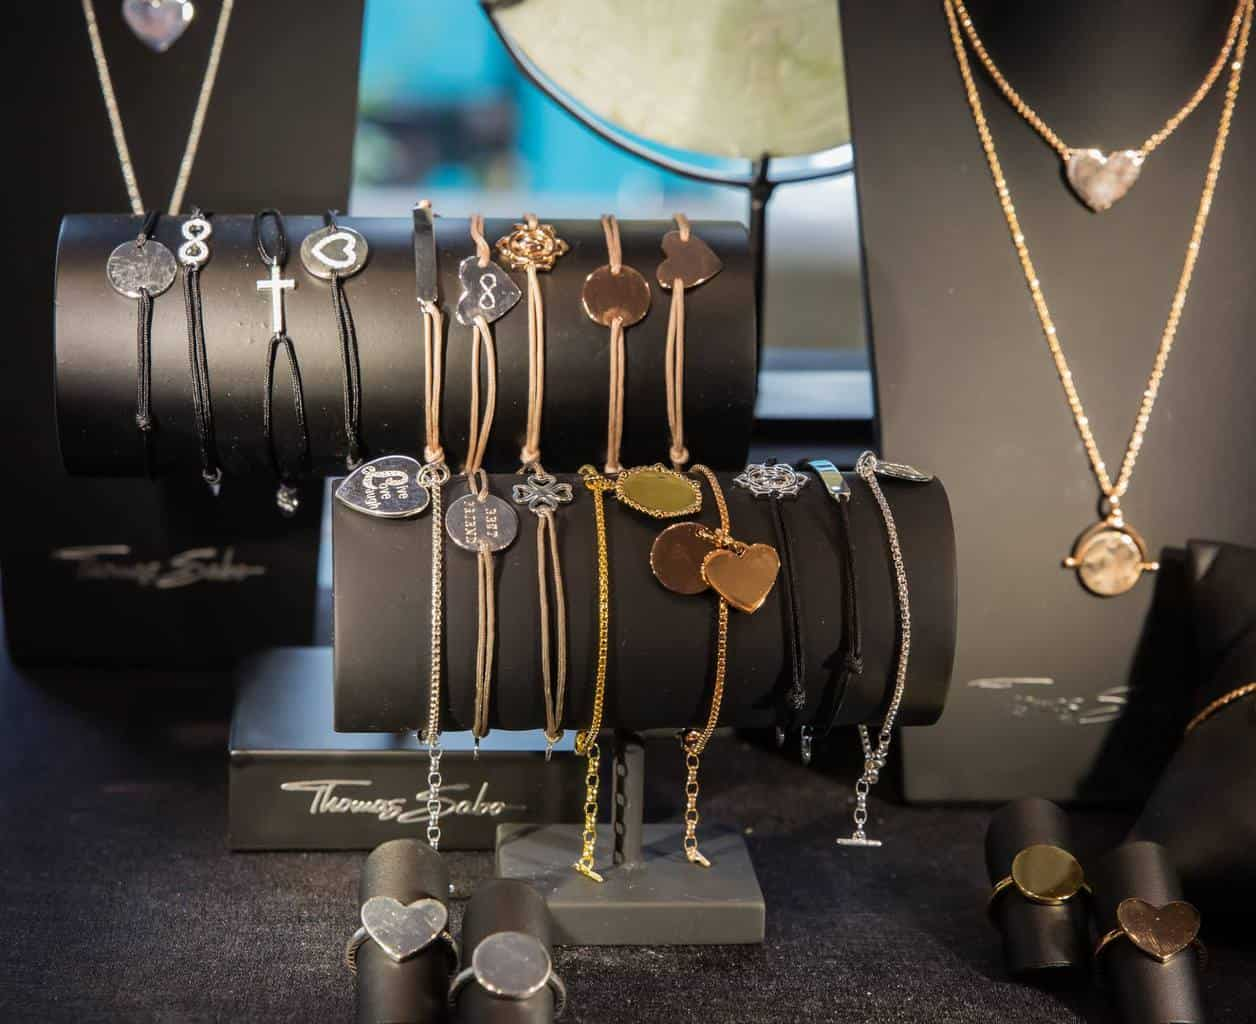 Thomas Sabo's Latest Collection and Perfume